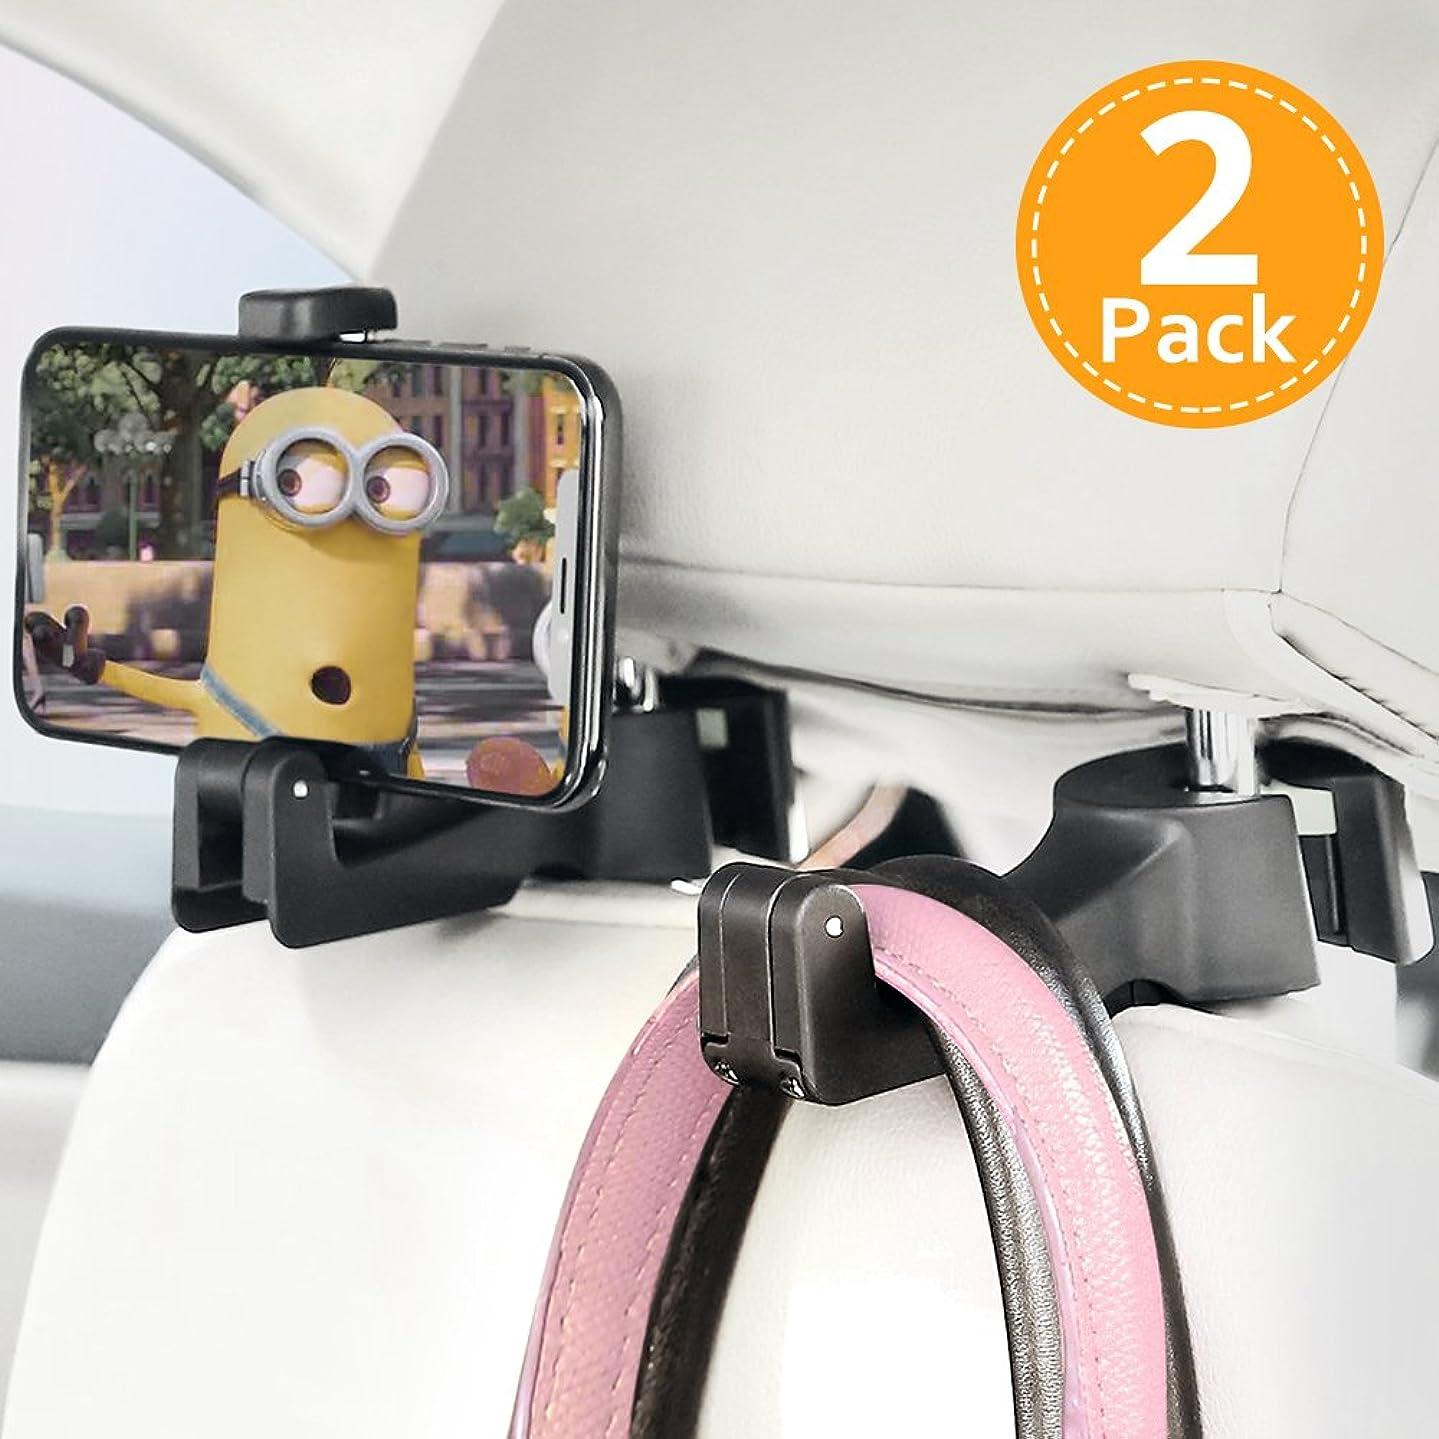 Ohuhu Purse Hook for Car Headrest 2-Pack, Car Headrest Hangers 2 in 1 Universal Front Seat Headrest Hook with Cellphone Holder